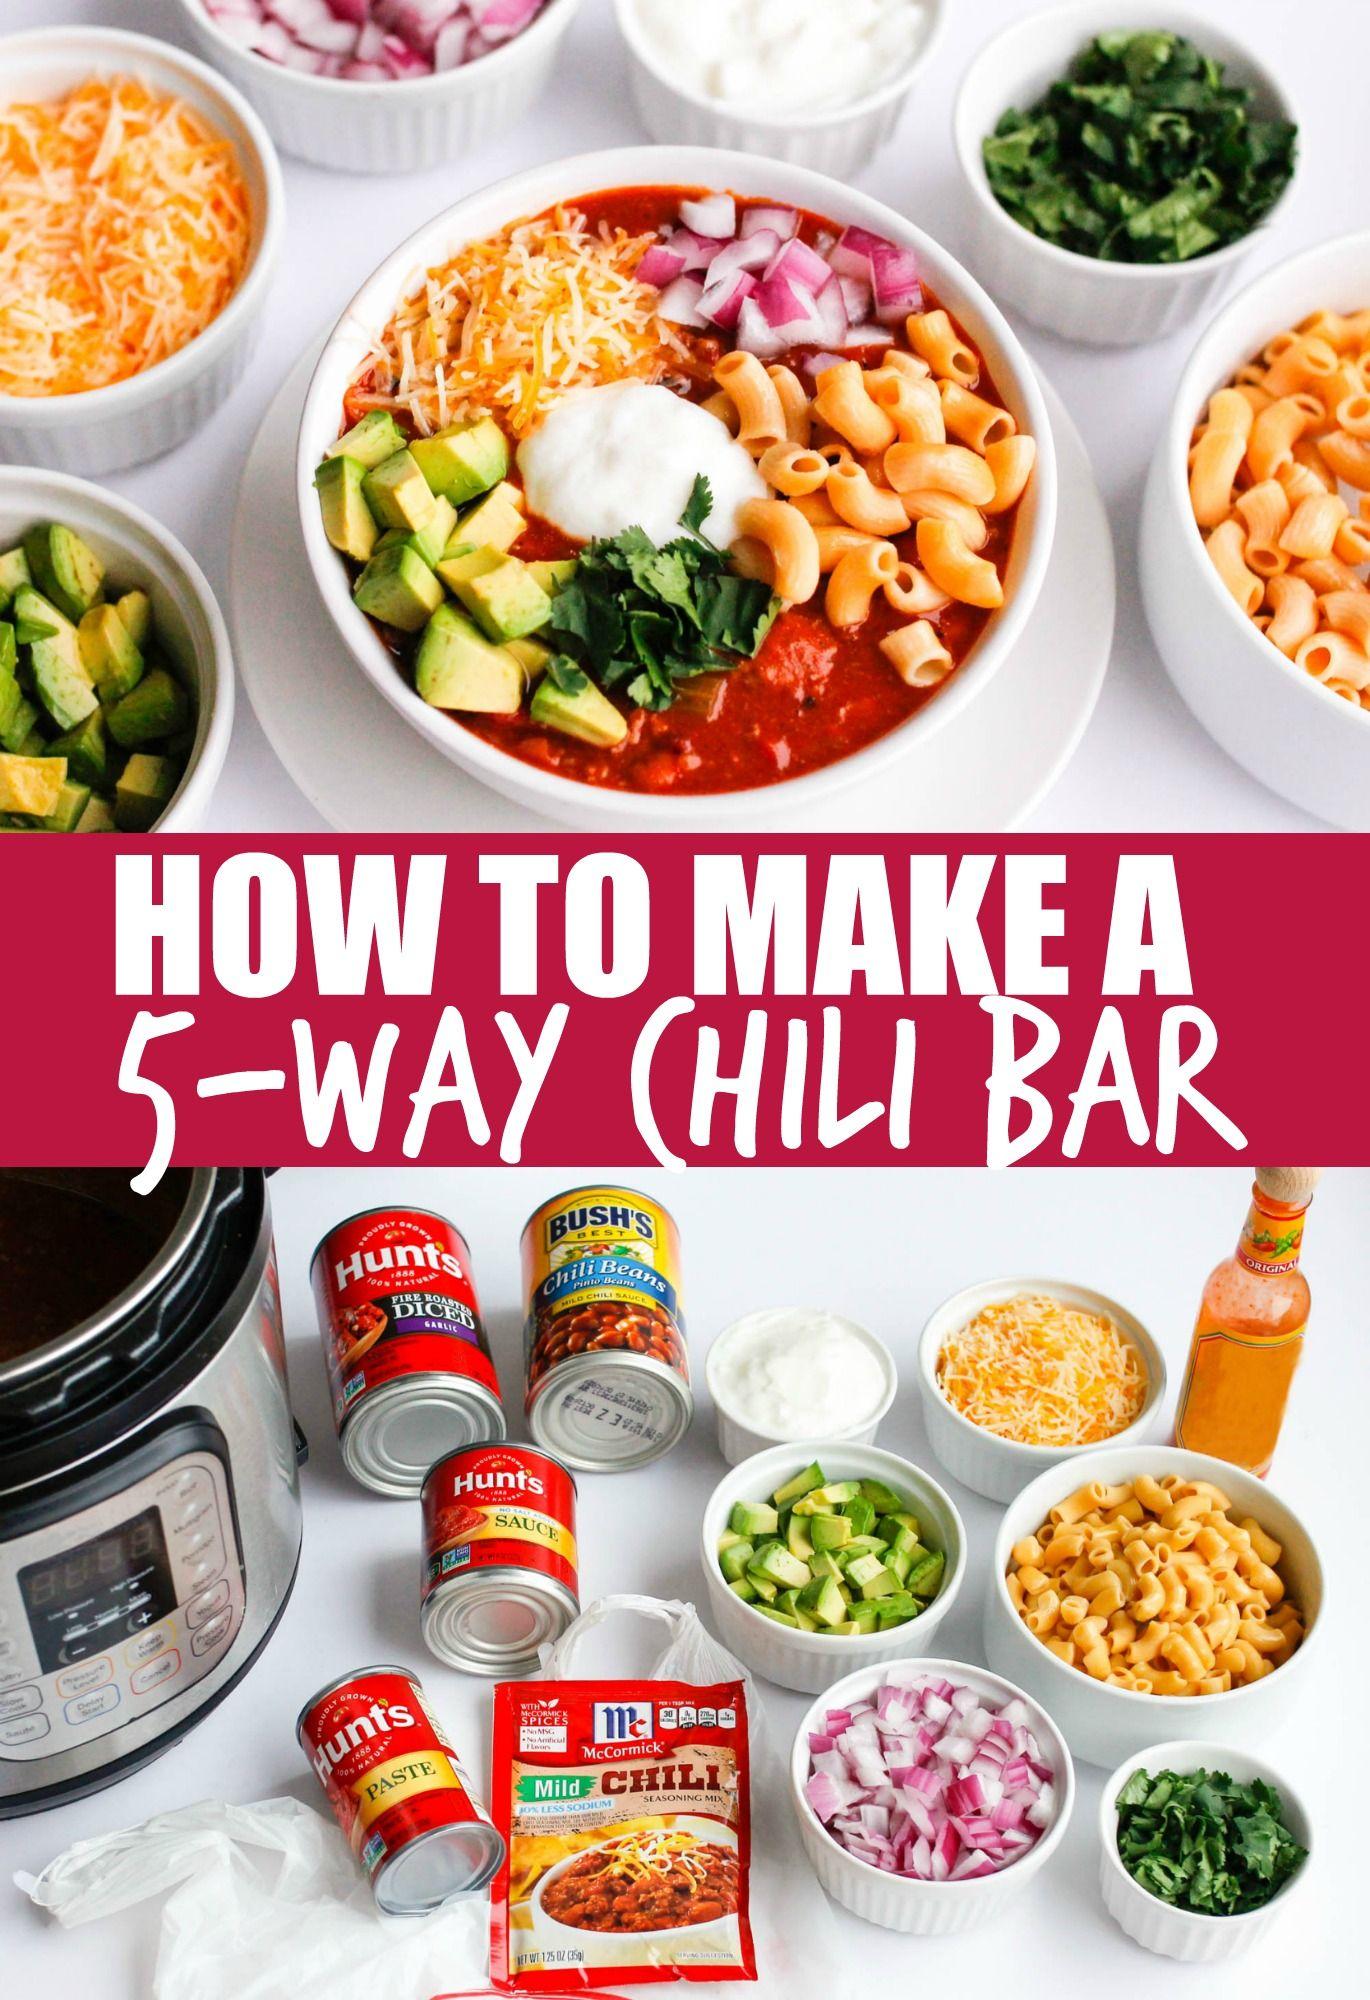 The Best Instant Pot Chili Recipe Chili Bar Pressure Cooker Chili Pressure Cooker Chili Recipe